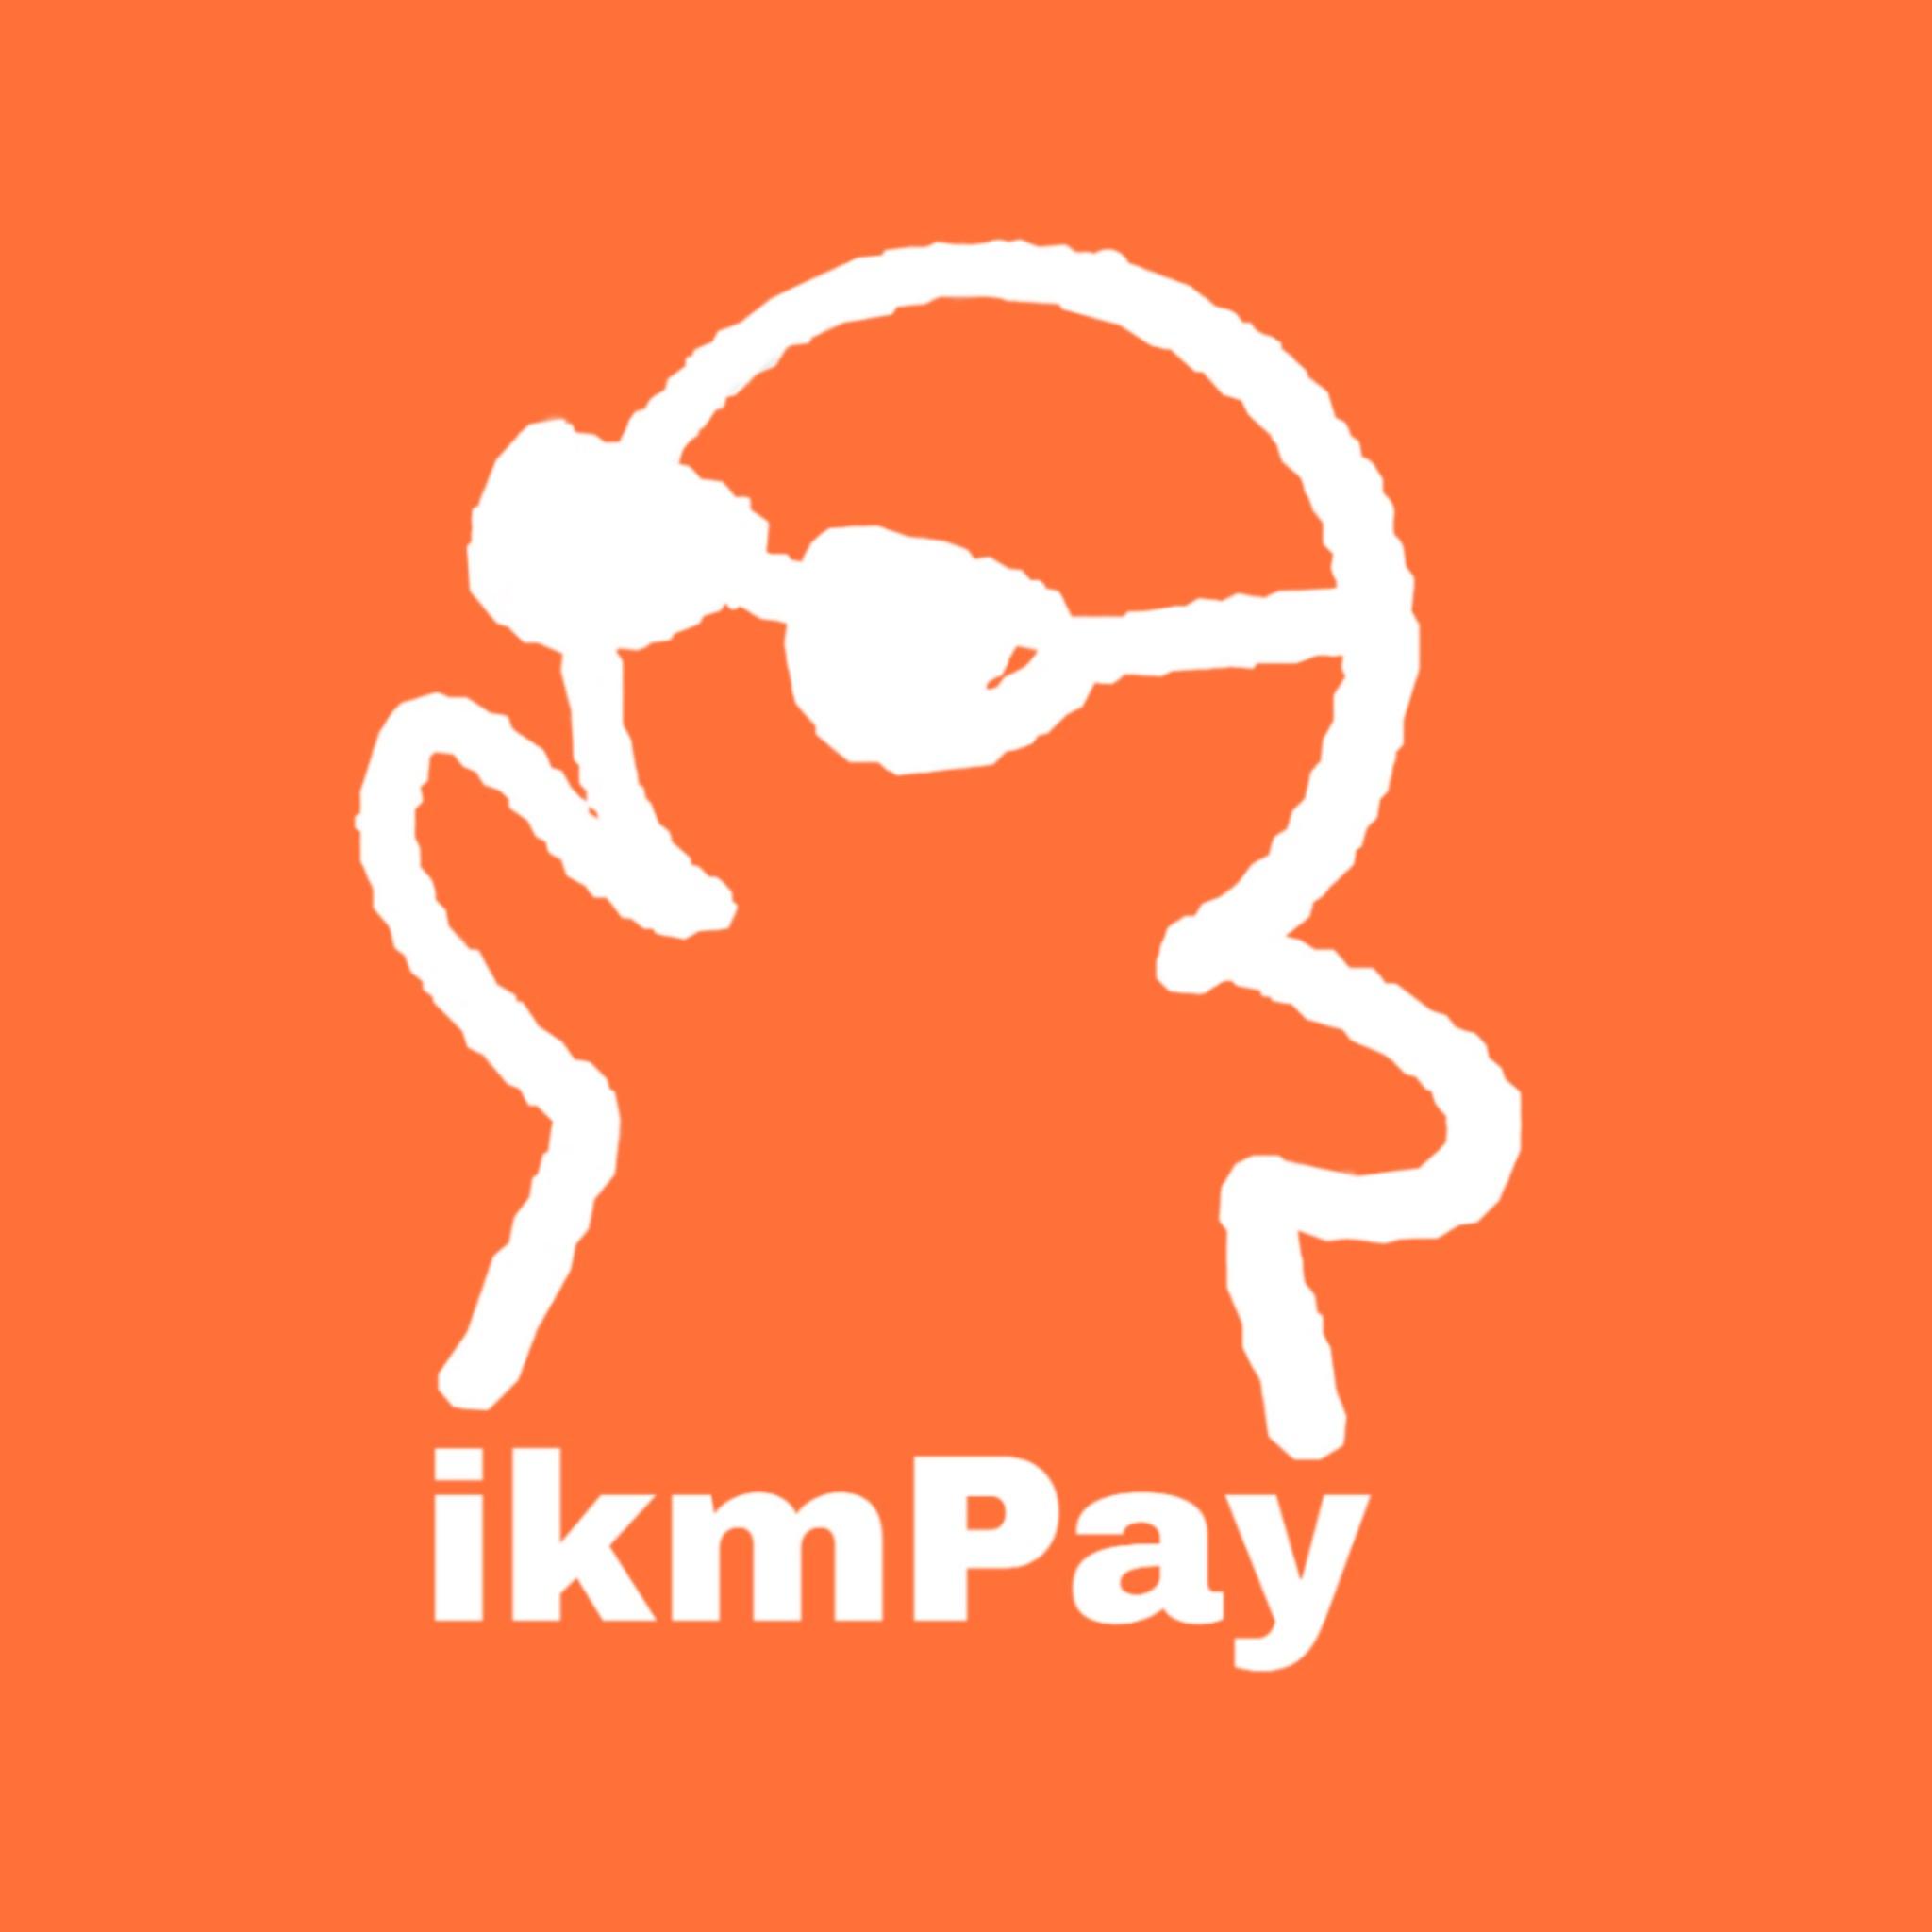 ikmPay